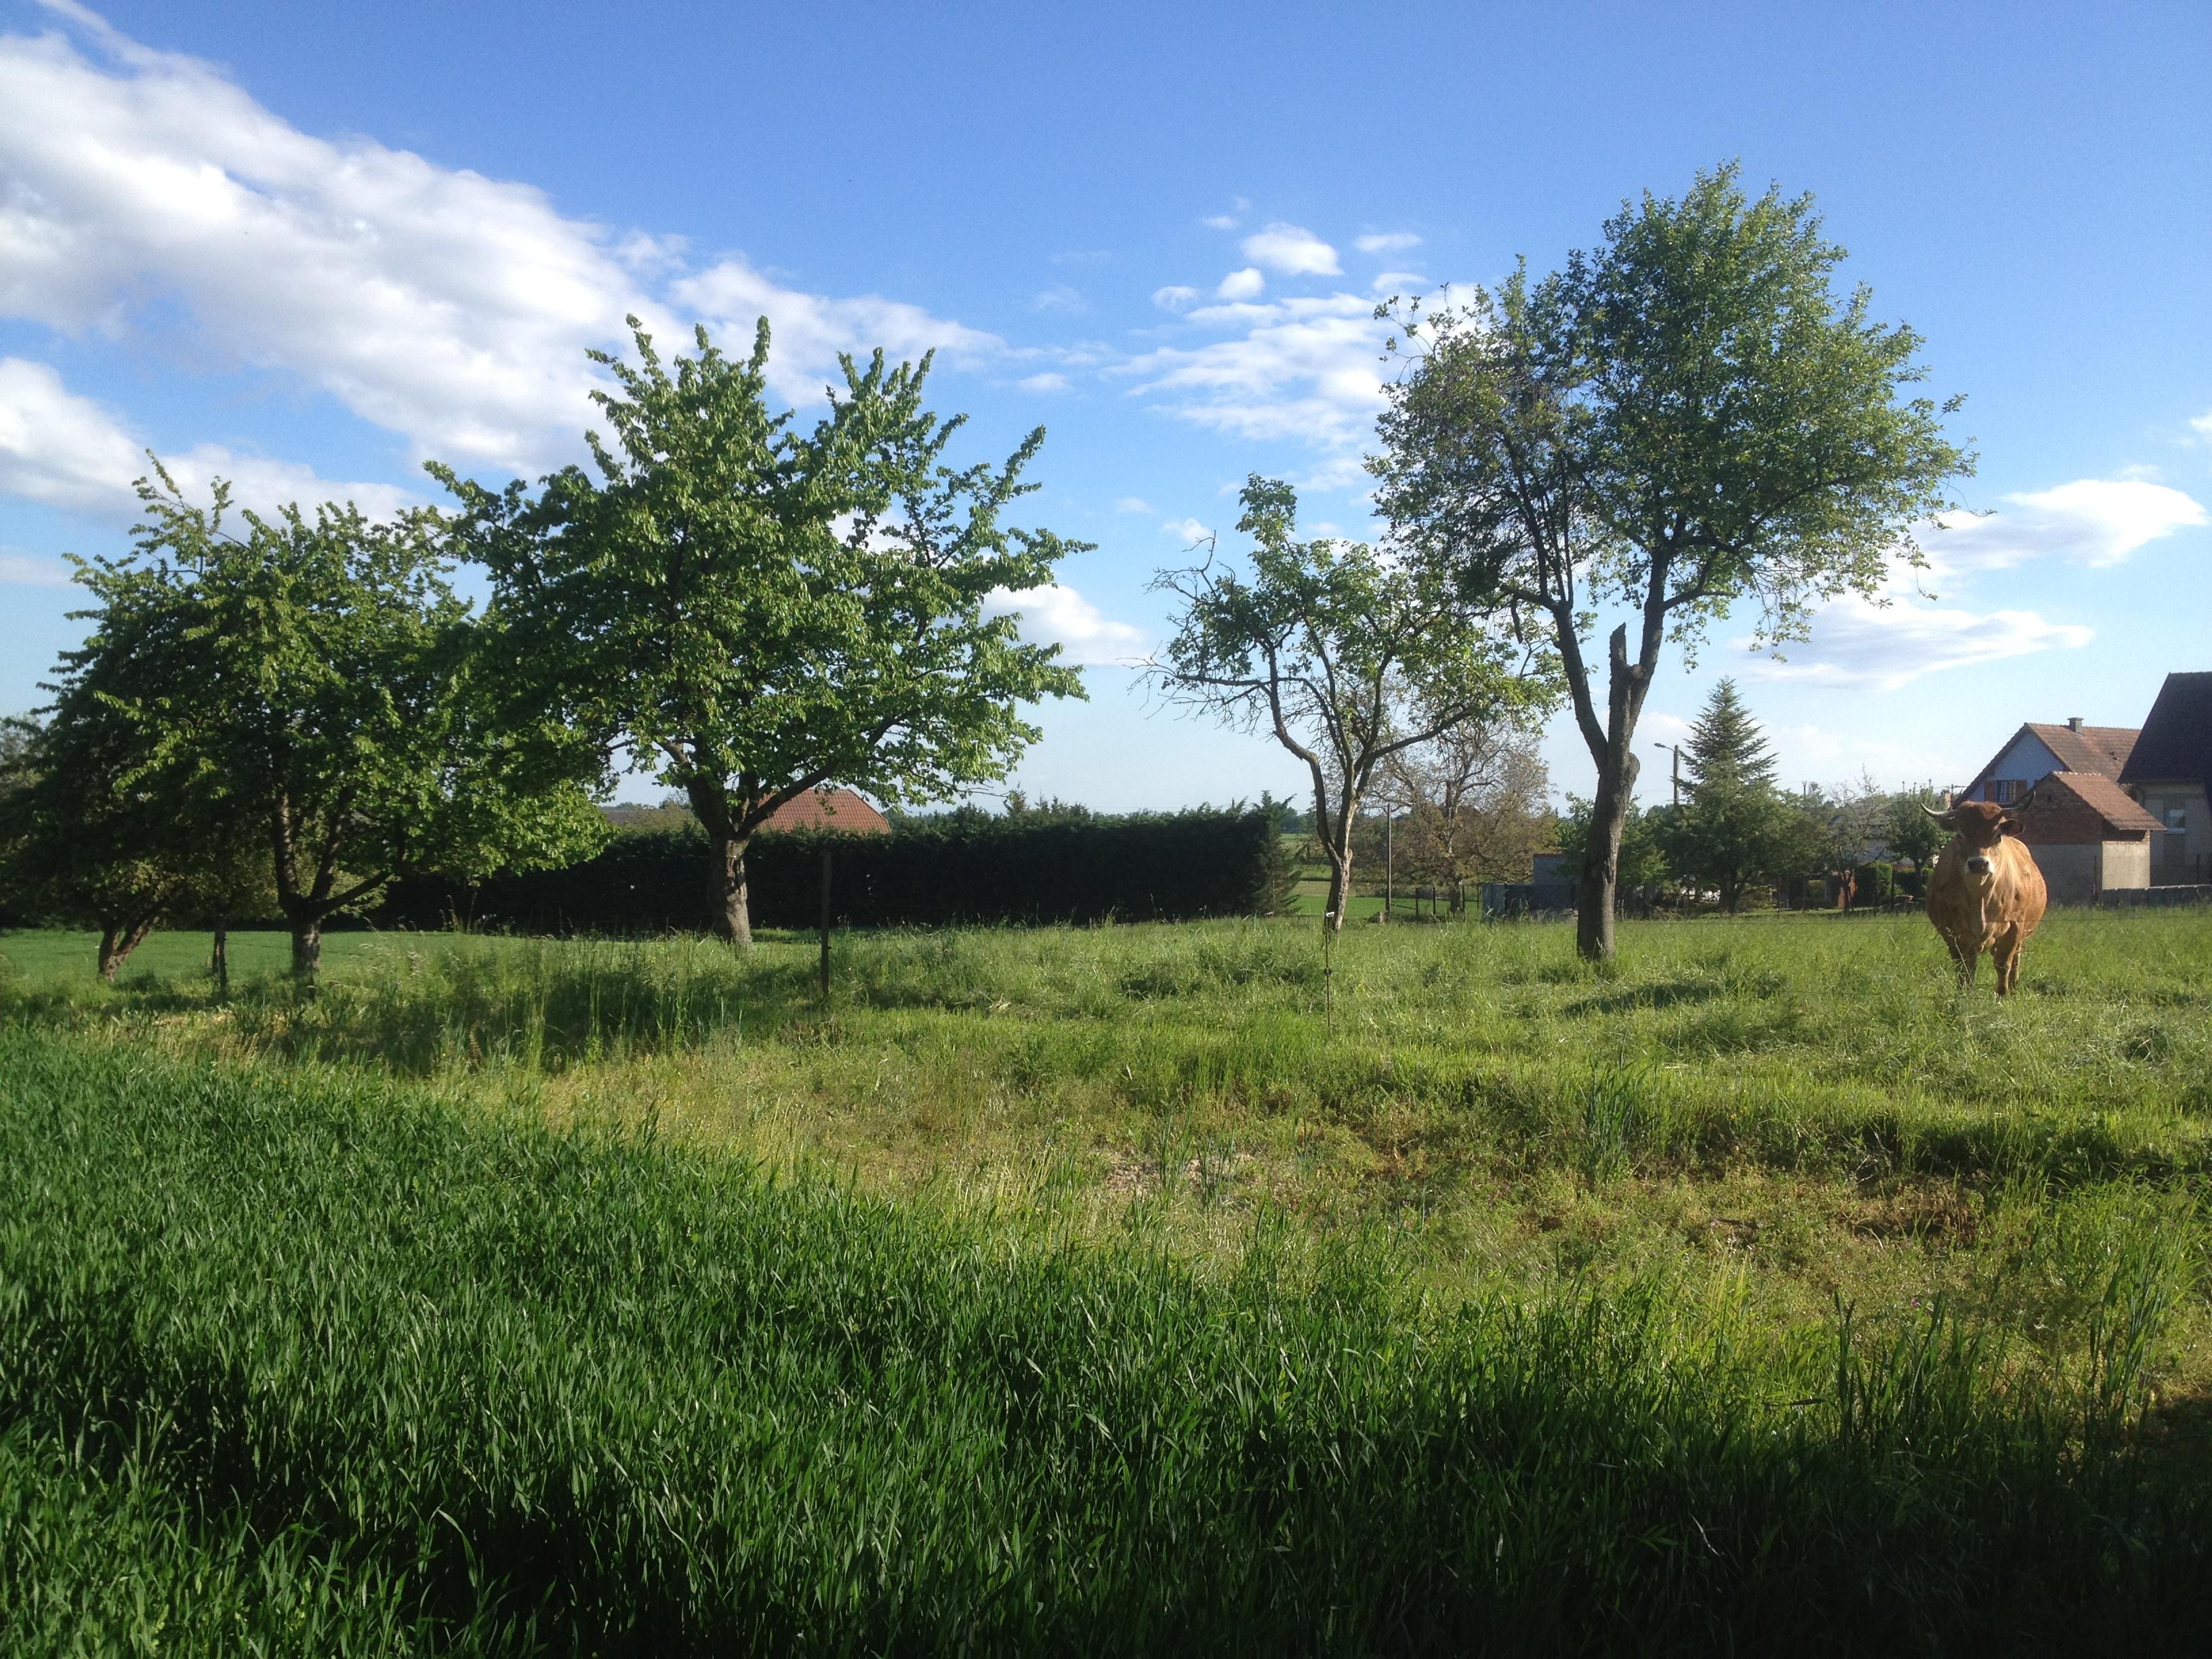 Terrains du constructeur LYCENE • 548 m² • MERXHEIM